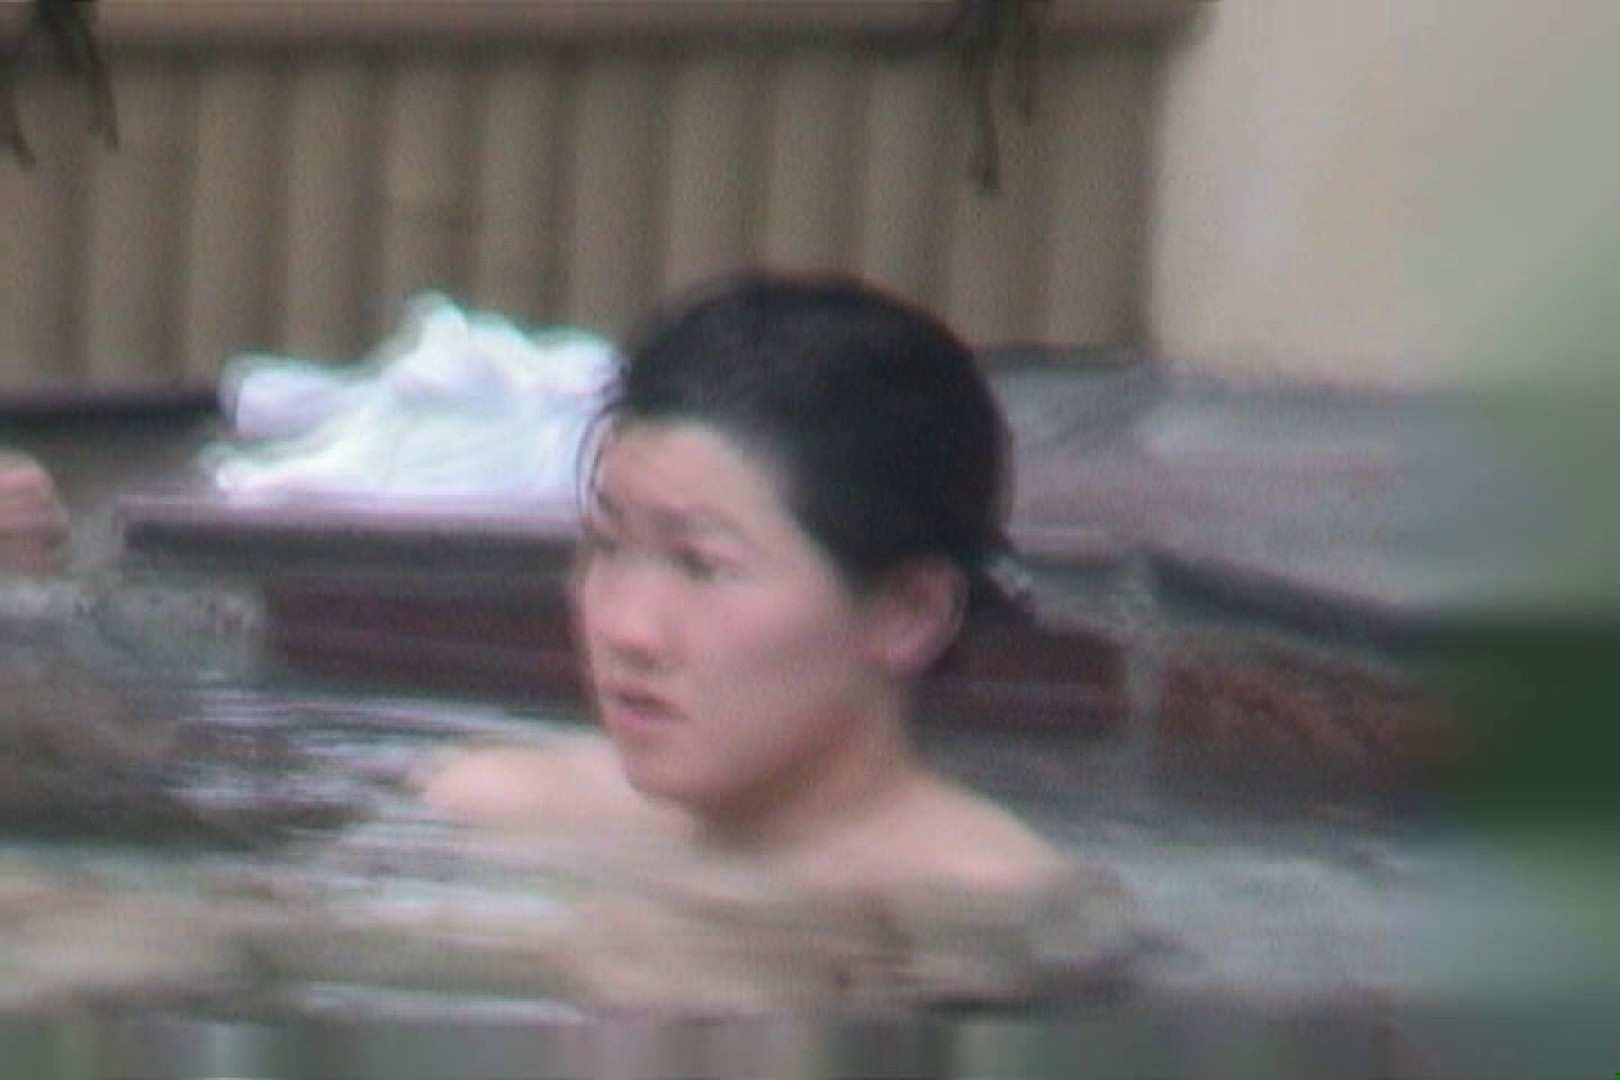 Aquaな露天風呂Vol.601 露天 オマンコ無修正動画無料 99pic 24